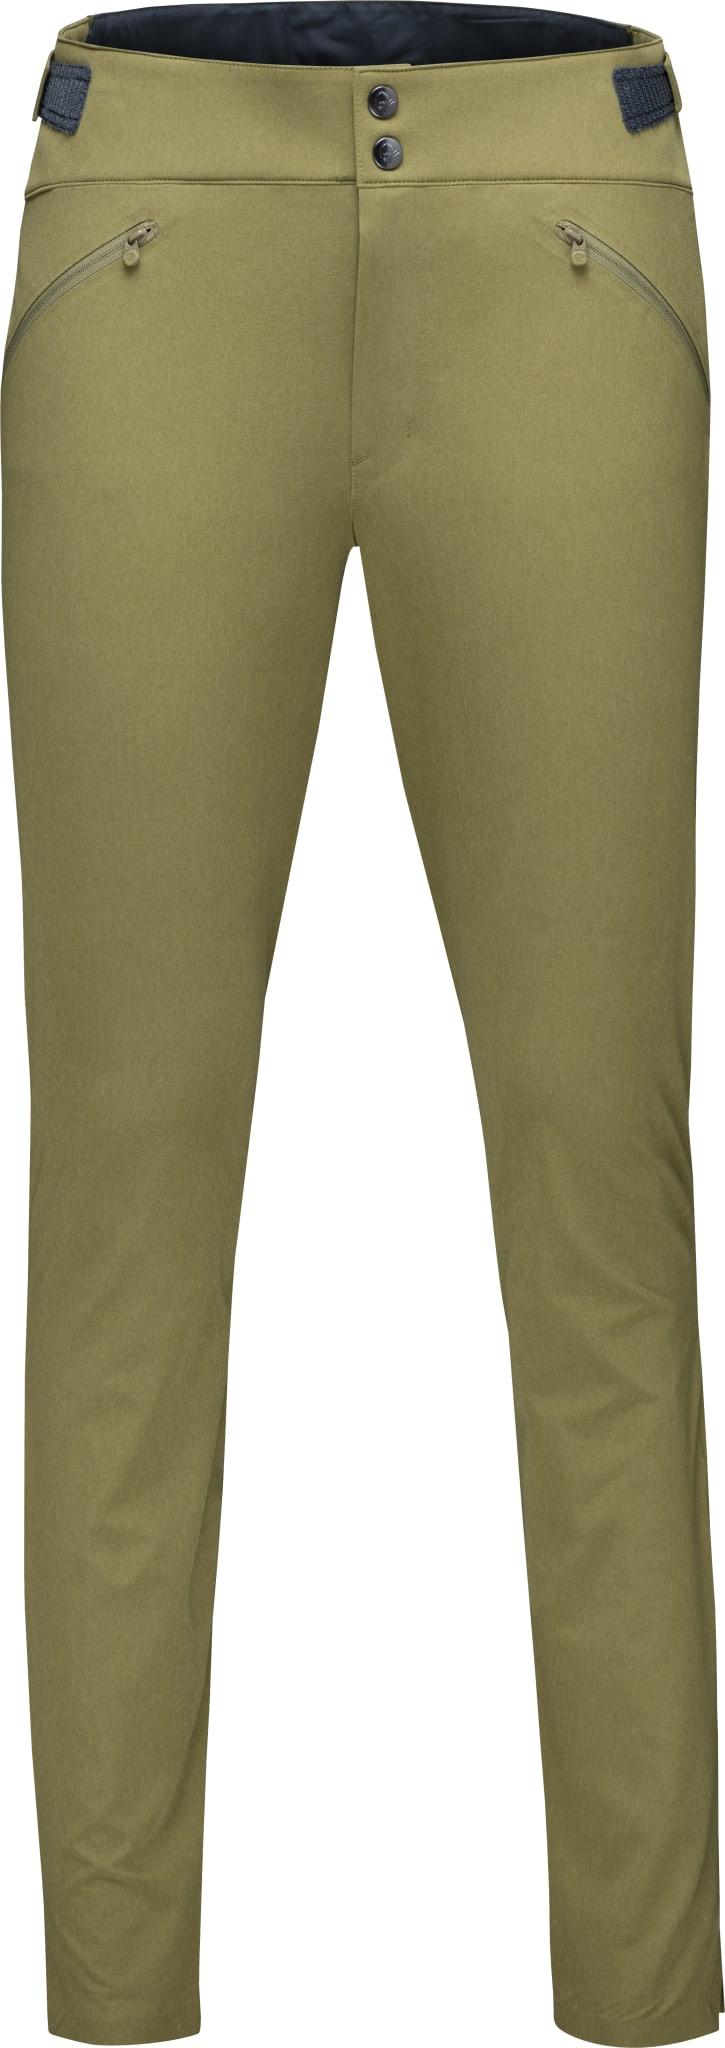 Falketind Flex1 Slim Pants W